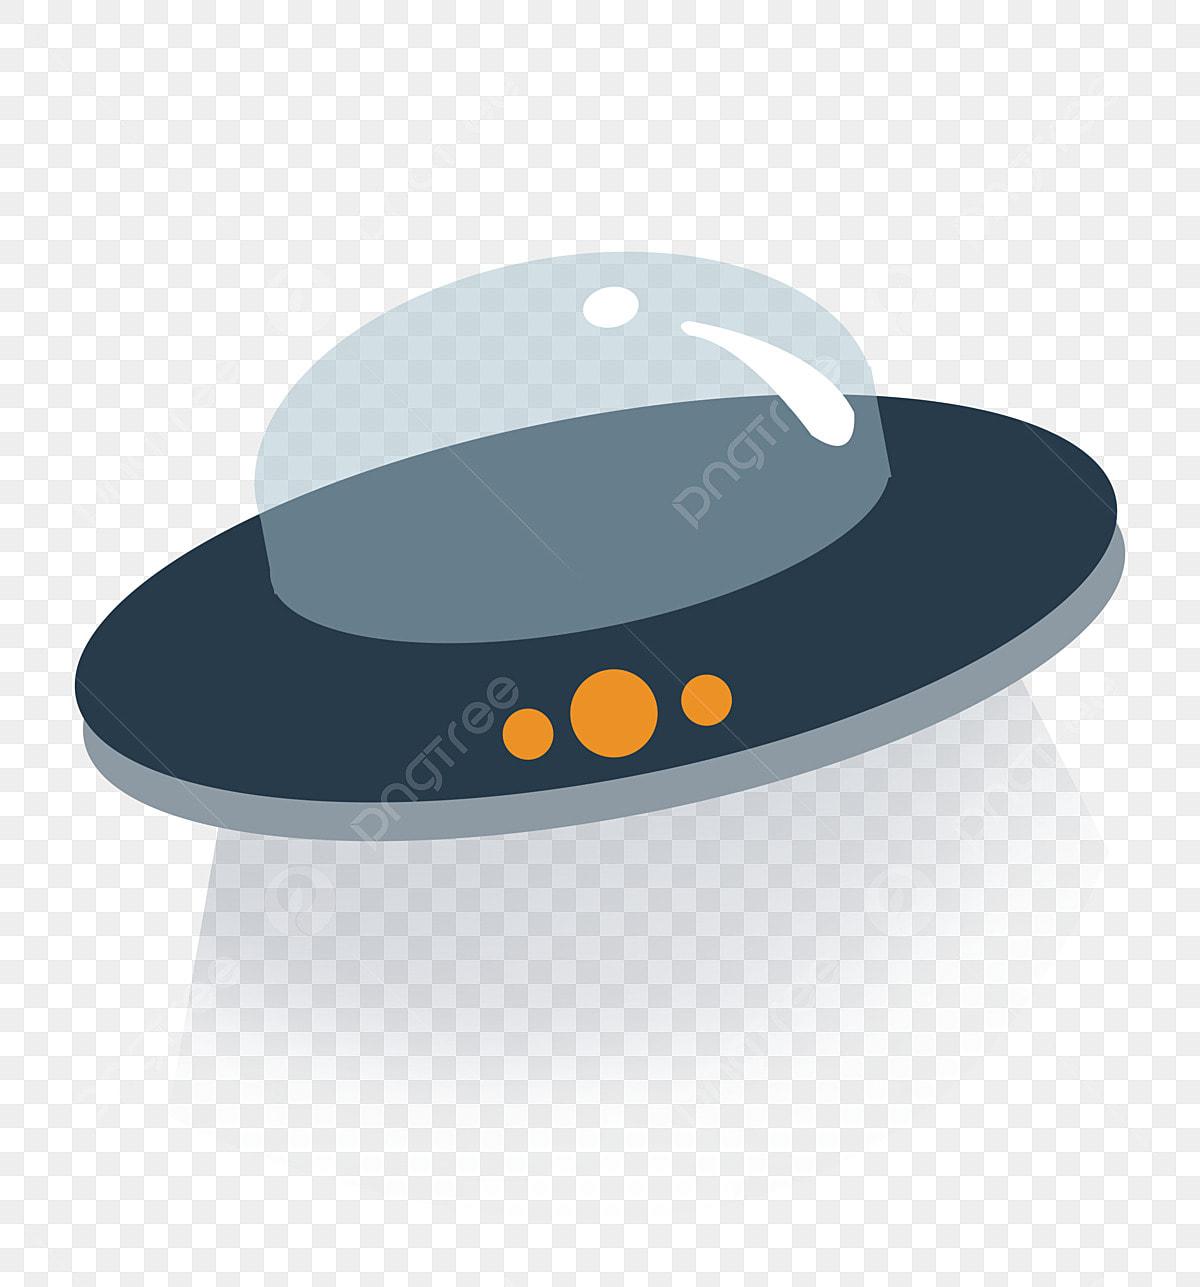 Ufo Ufo風イラスト 空飛ぶ円盤 Ufo イラスト Ufo 宇宙船 テクノロジー